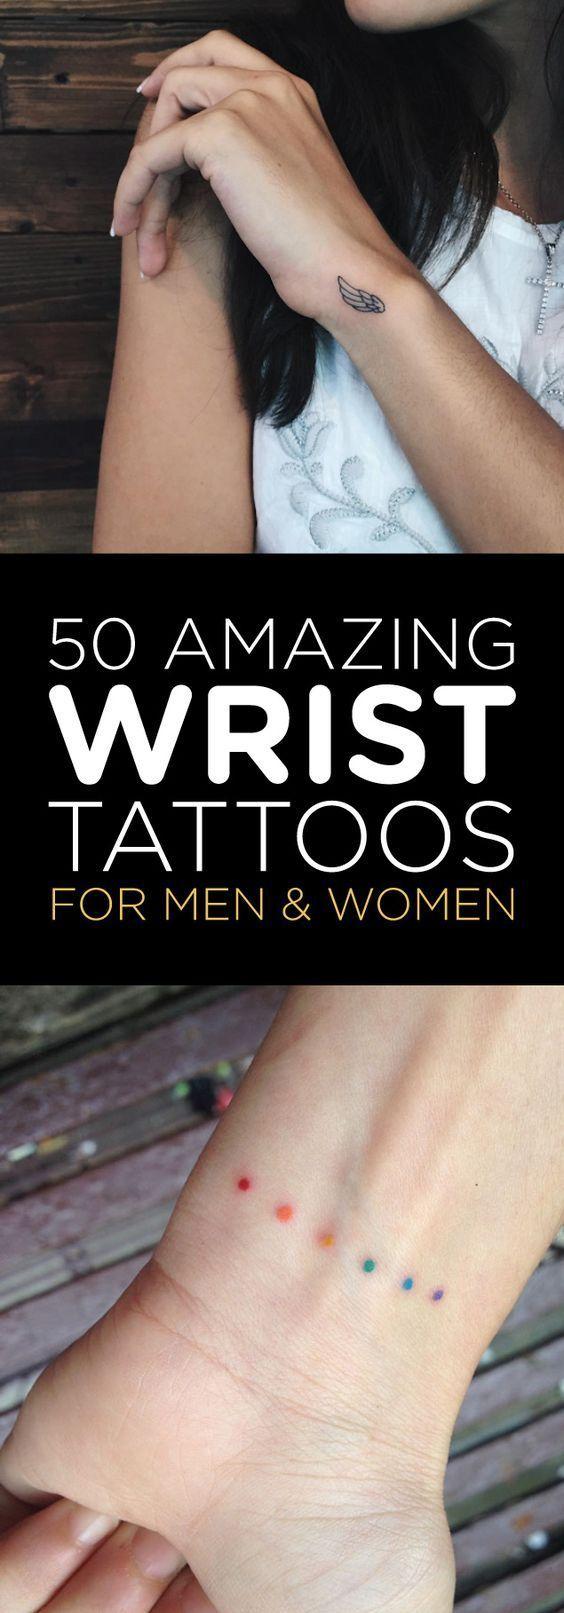 50 intricate henna tattoo designs art and design 50 - 50 Amazing Wrist Tattoo Designs Tattooblend